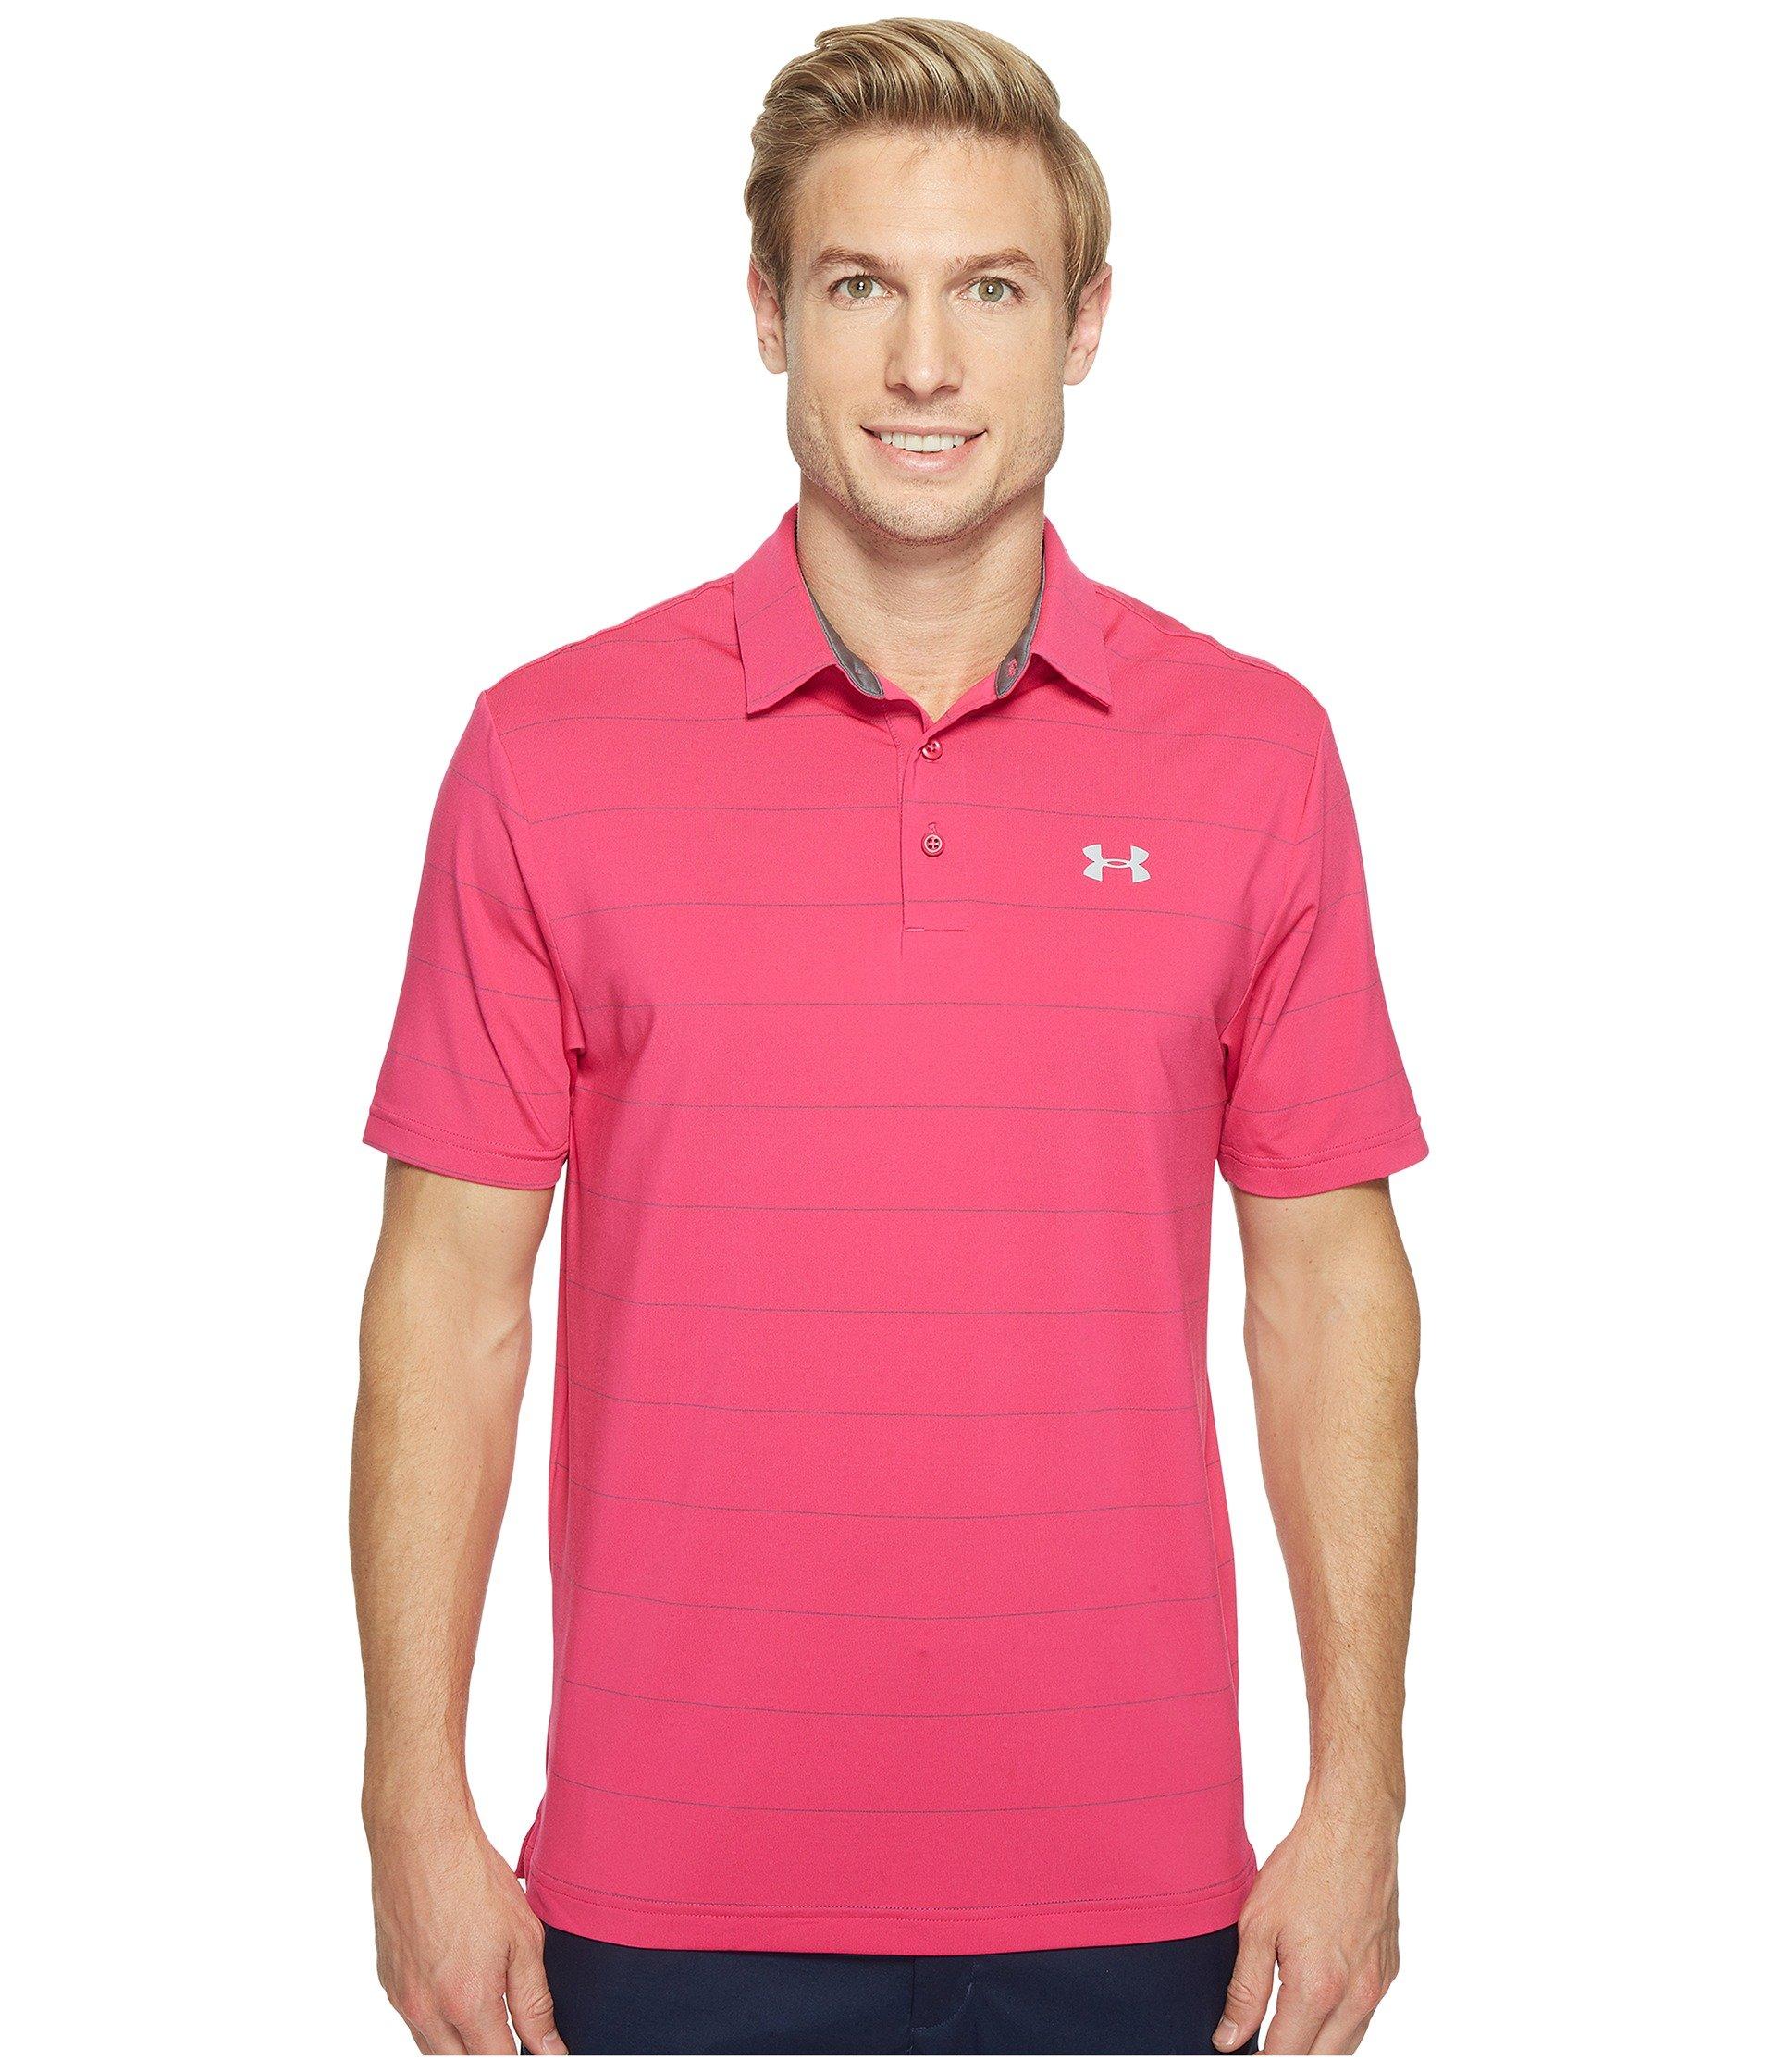 Camiseta Tipo Polo para Hombre Under Armour Golf UA Playoff Polo - Power In Pink  + Under Armour en VeoyCompro.net